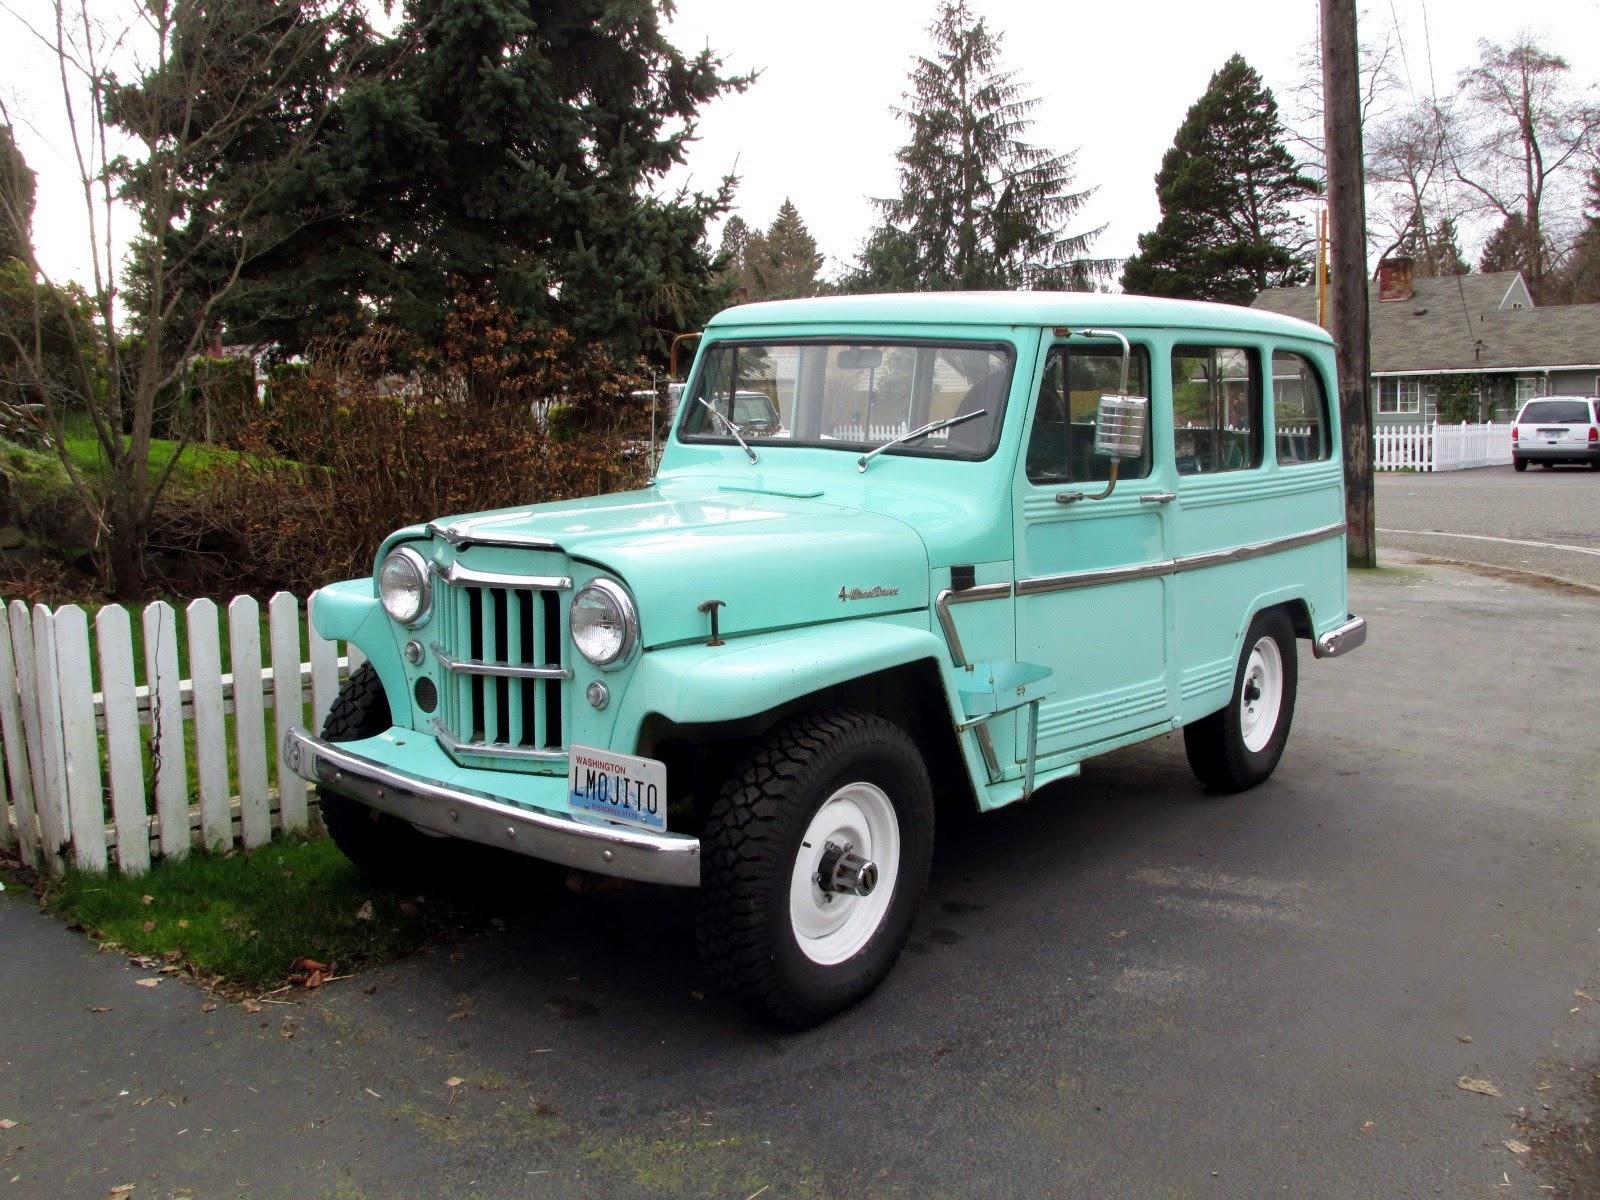 Willys Pickup For Sale Craigslist New Car Models 2019 2020 1941 Jeep Station Wagon 1960 Overland Wagonhtml